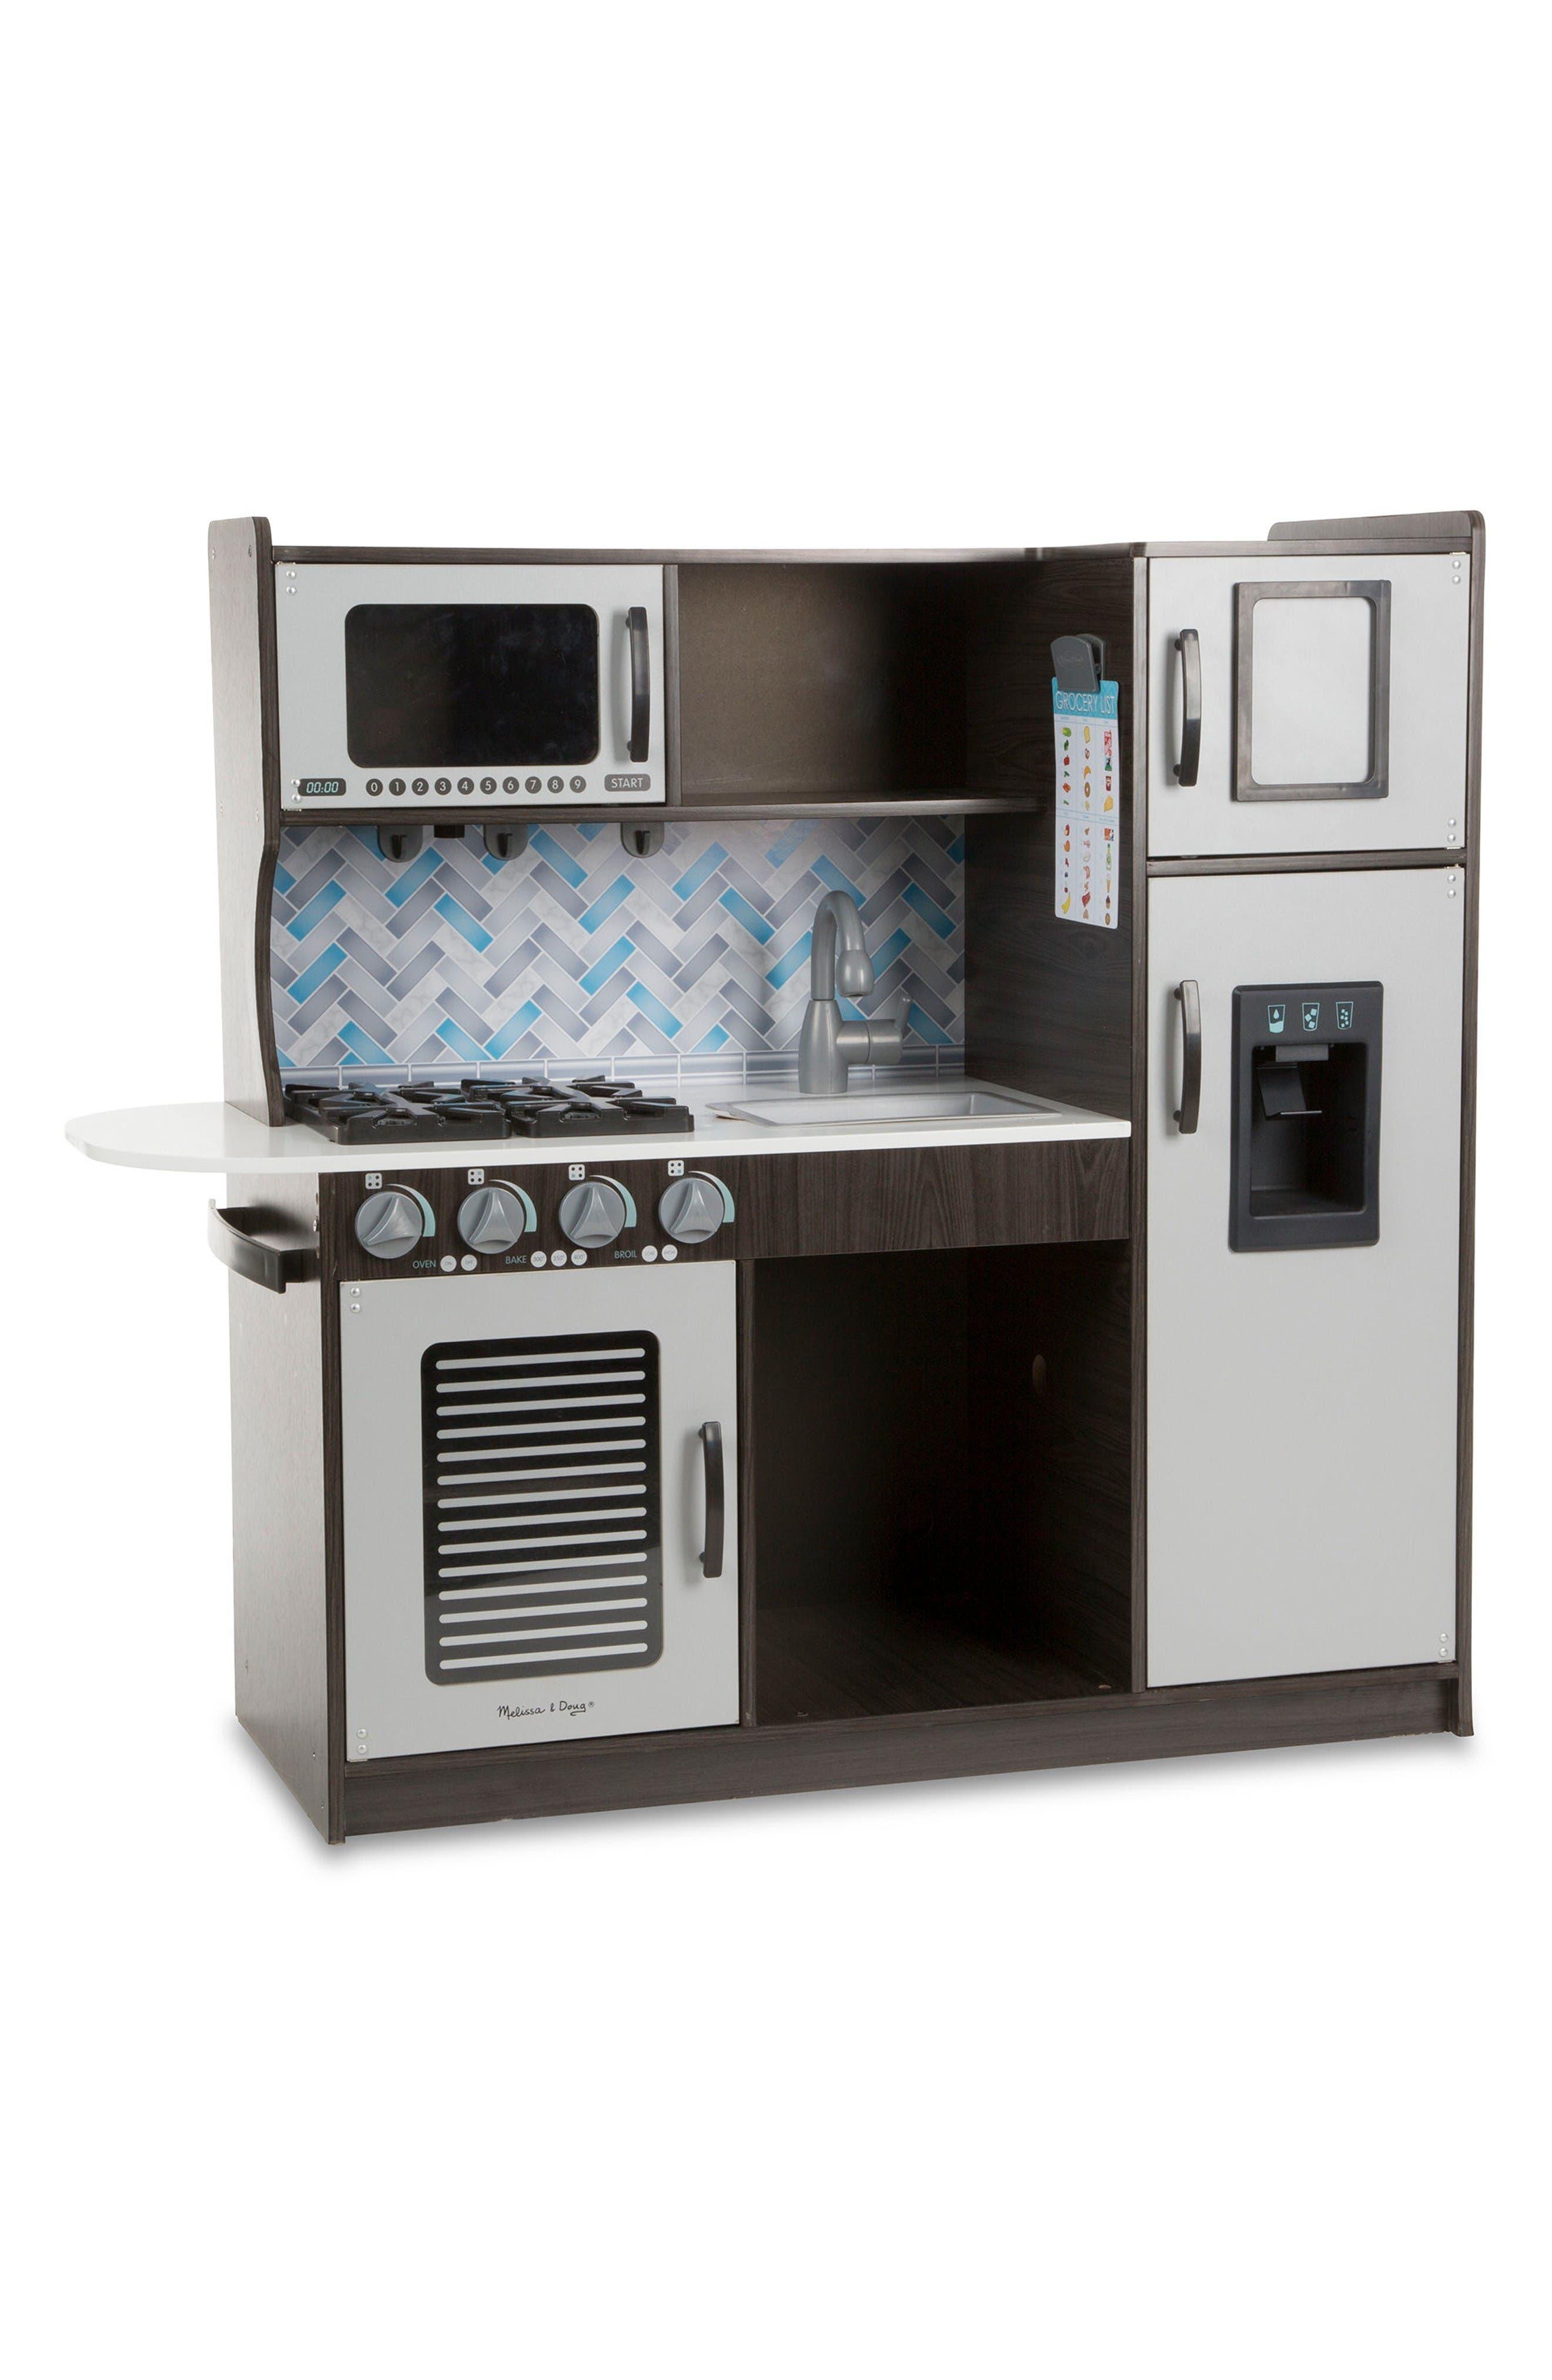 Main Image - Melissa & Doug Wooden Chef's Kitchen